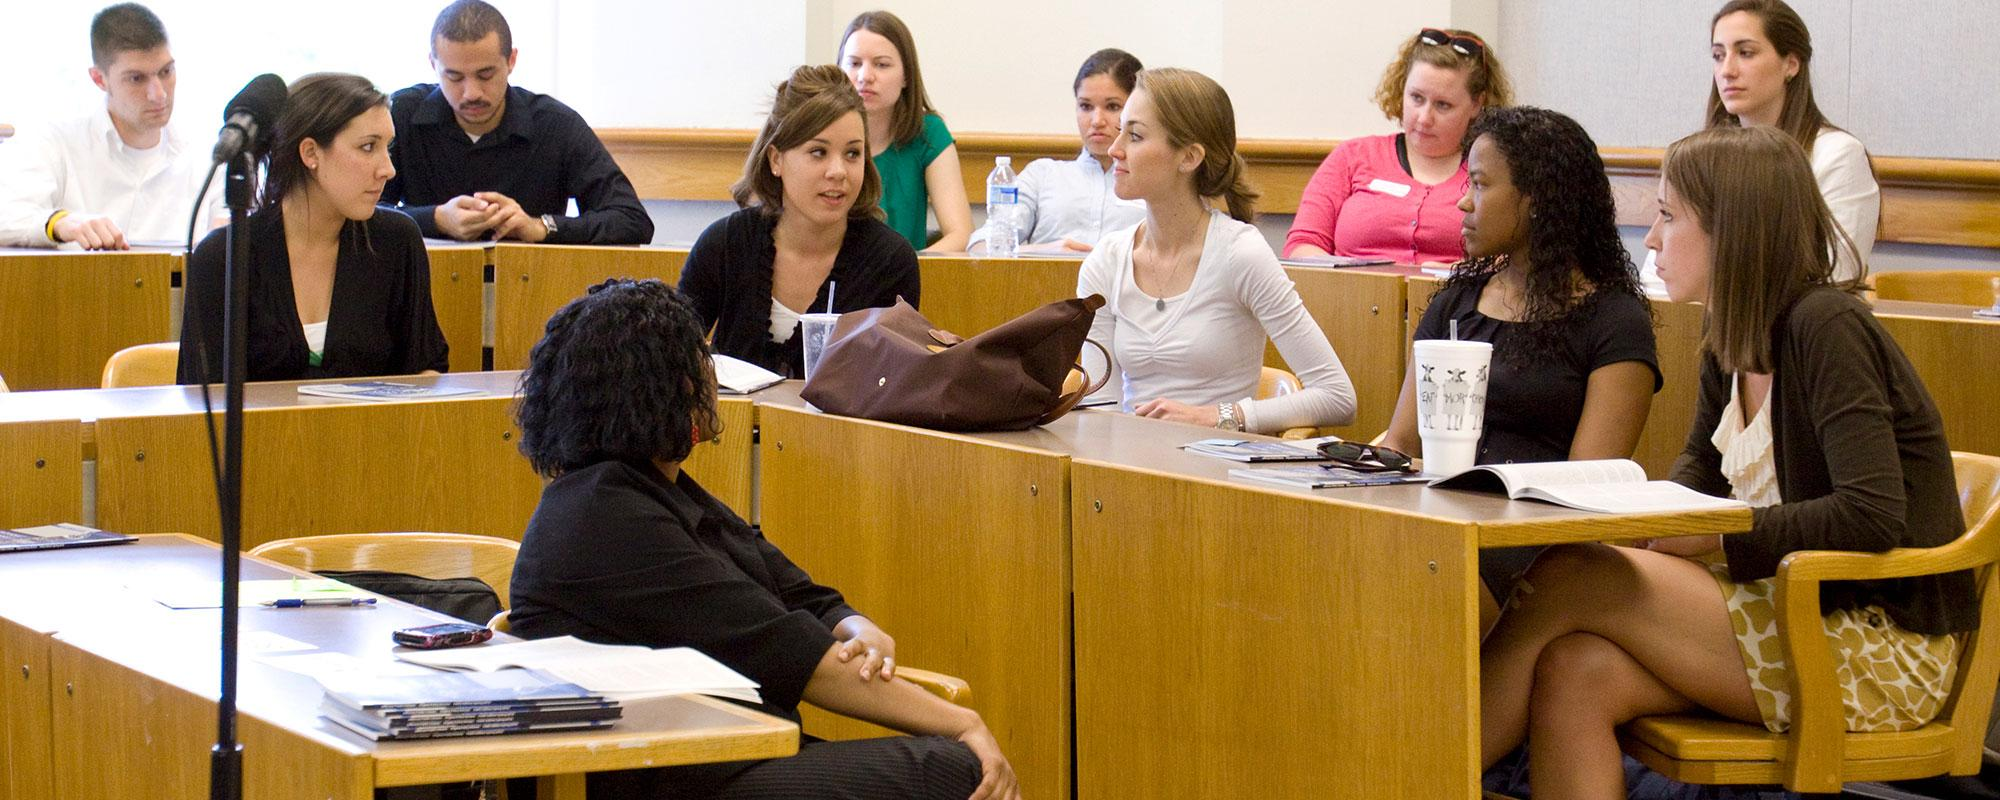 Jefferson Public Citizens students in class